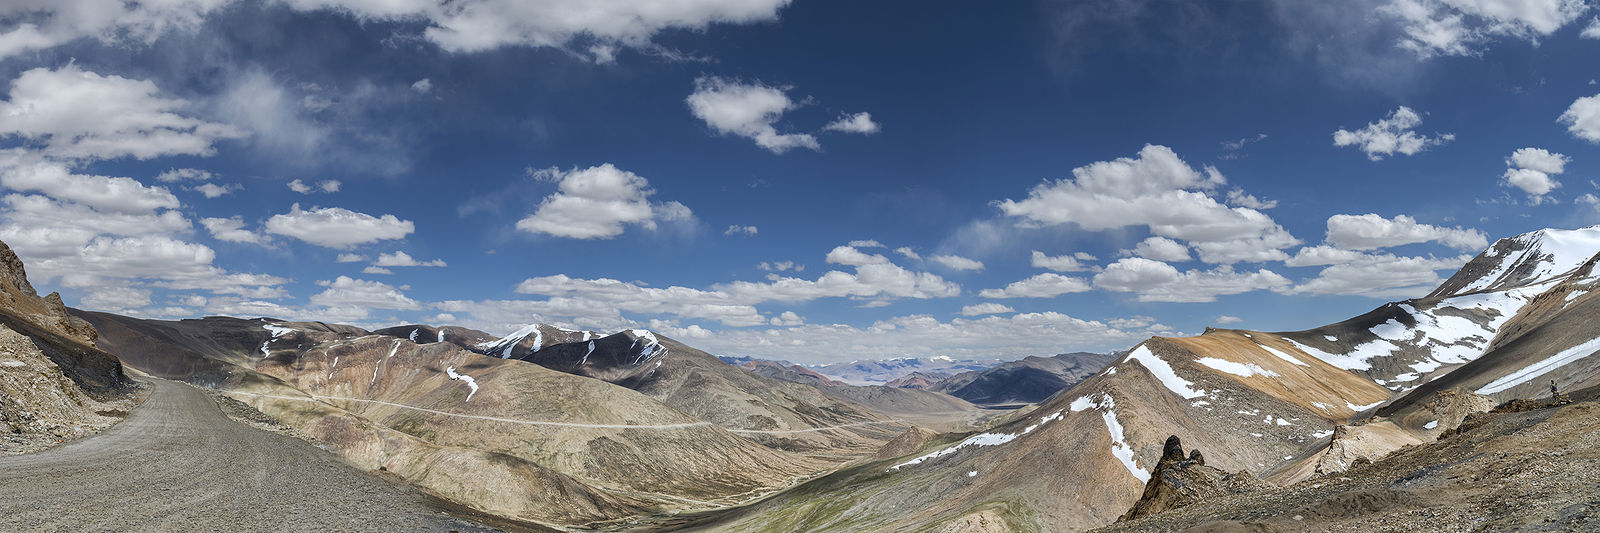 Ivan Aleshin. NH21 and other Himalayan Roads. 0006